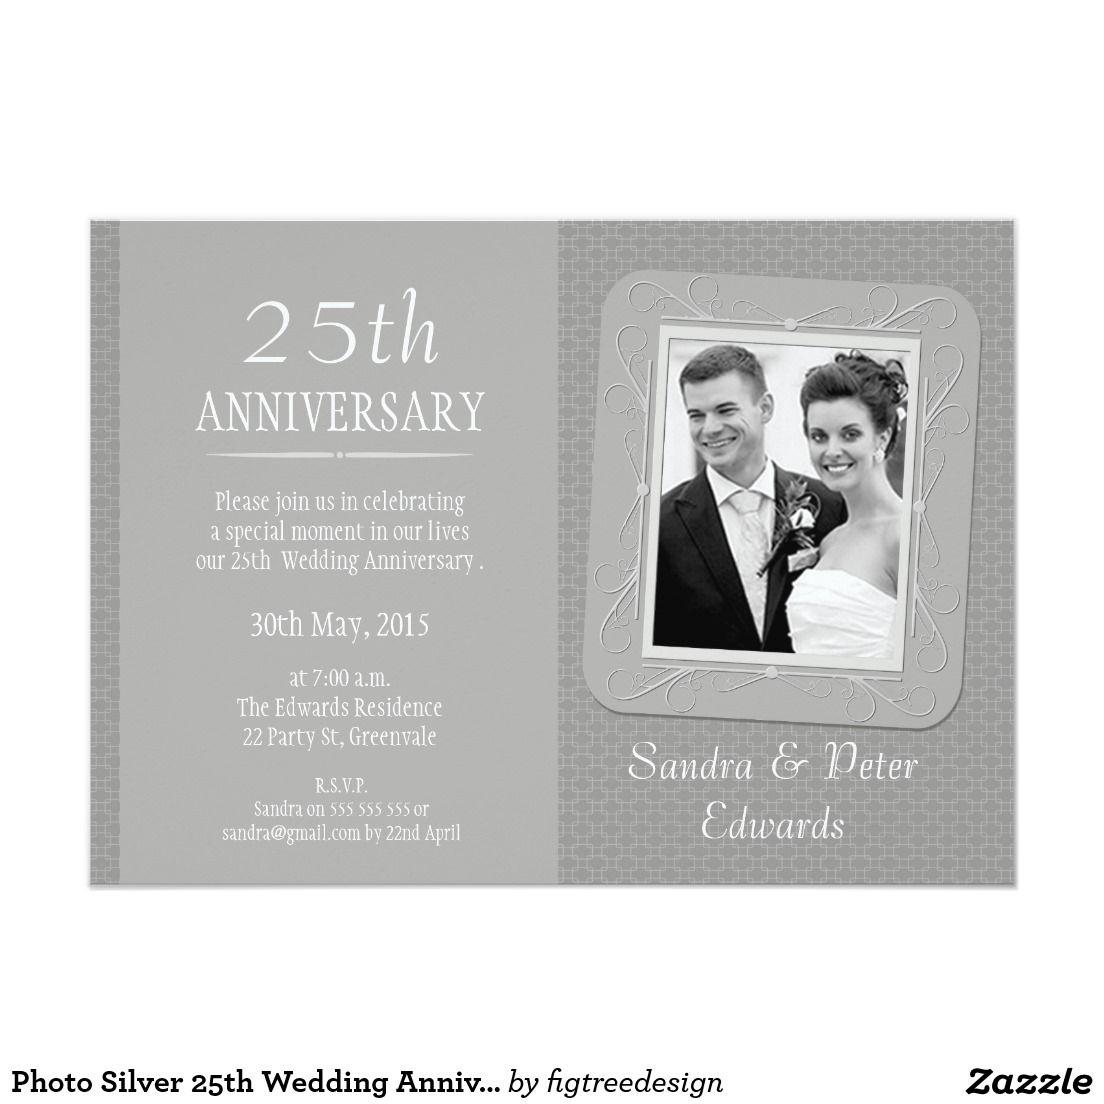 Photo Silver 25th Wedding Anniversary Invitation | Pinterest ...